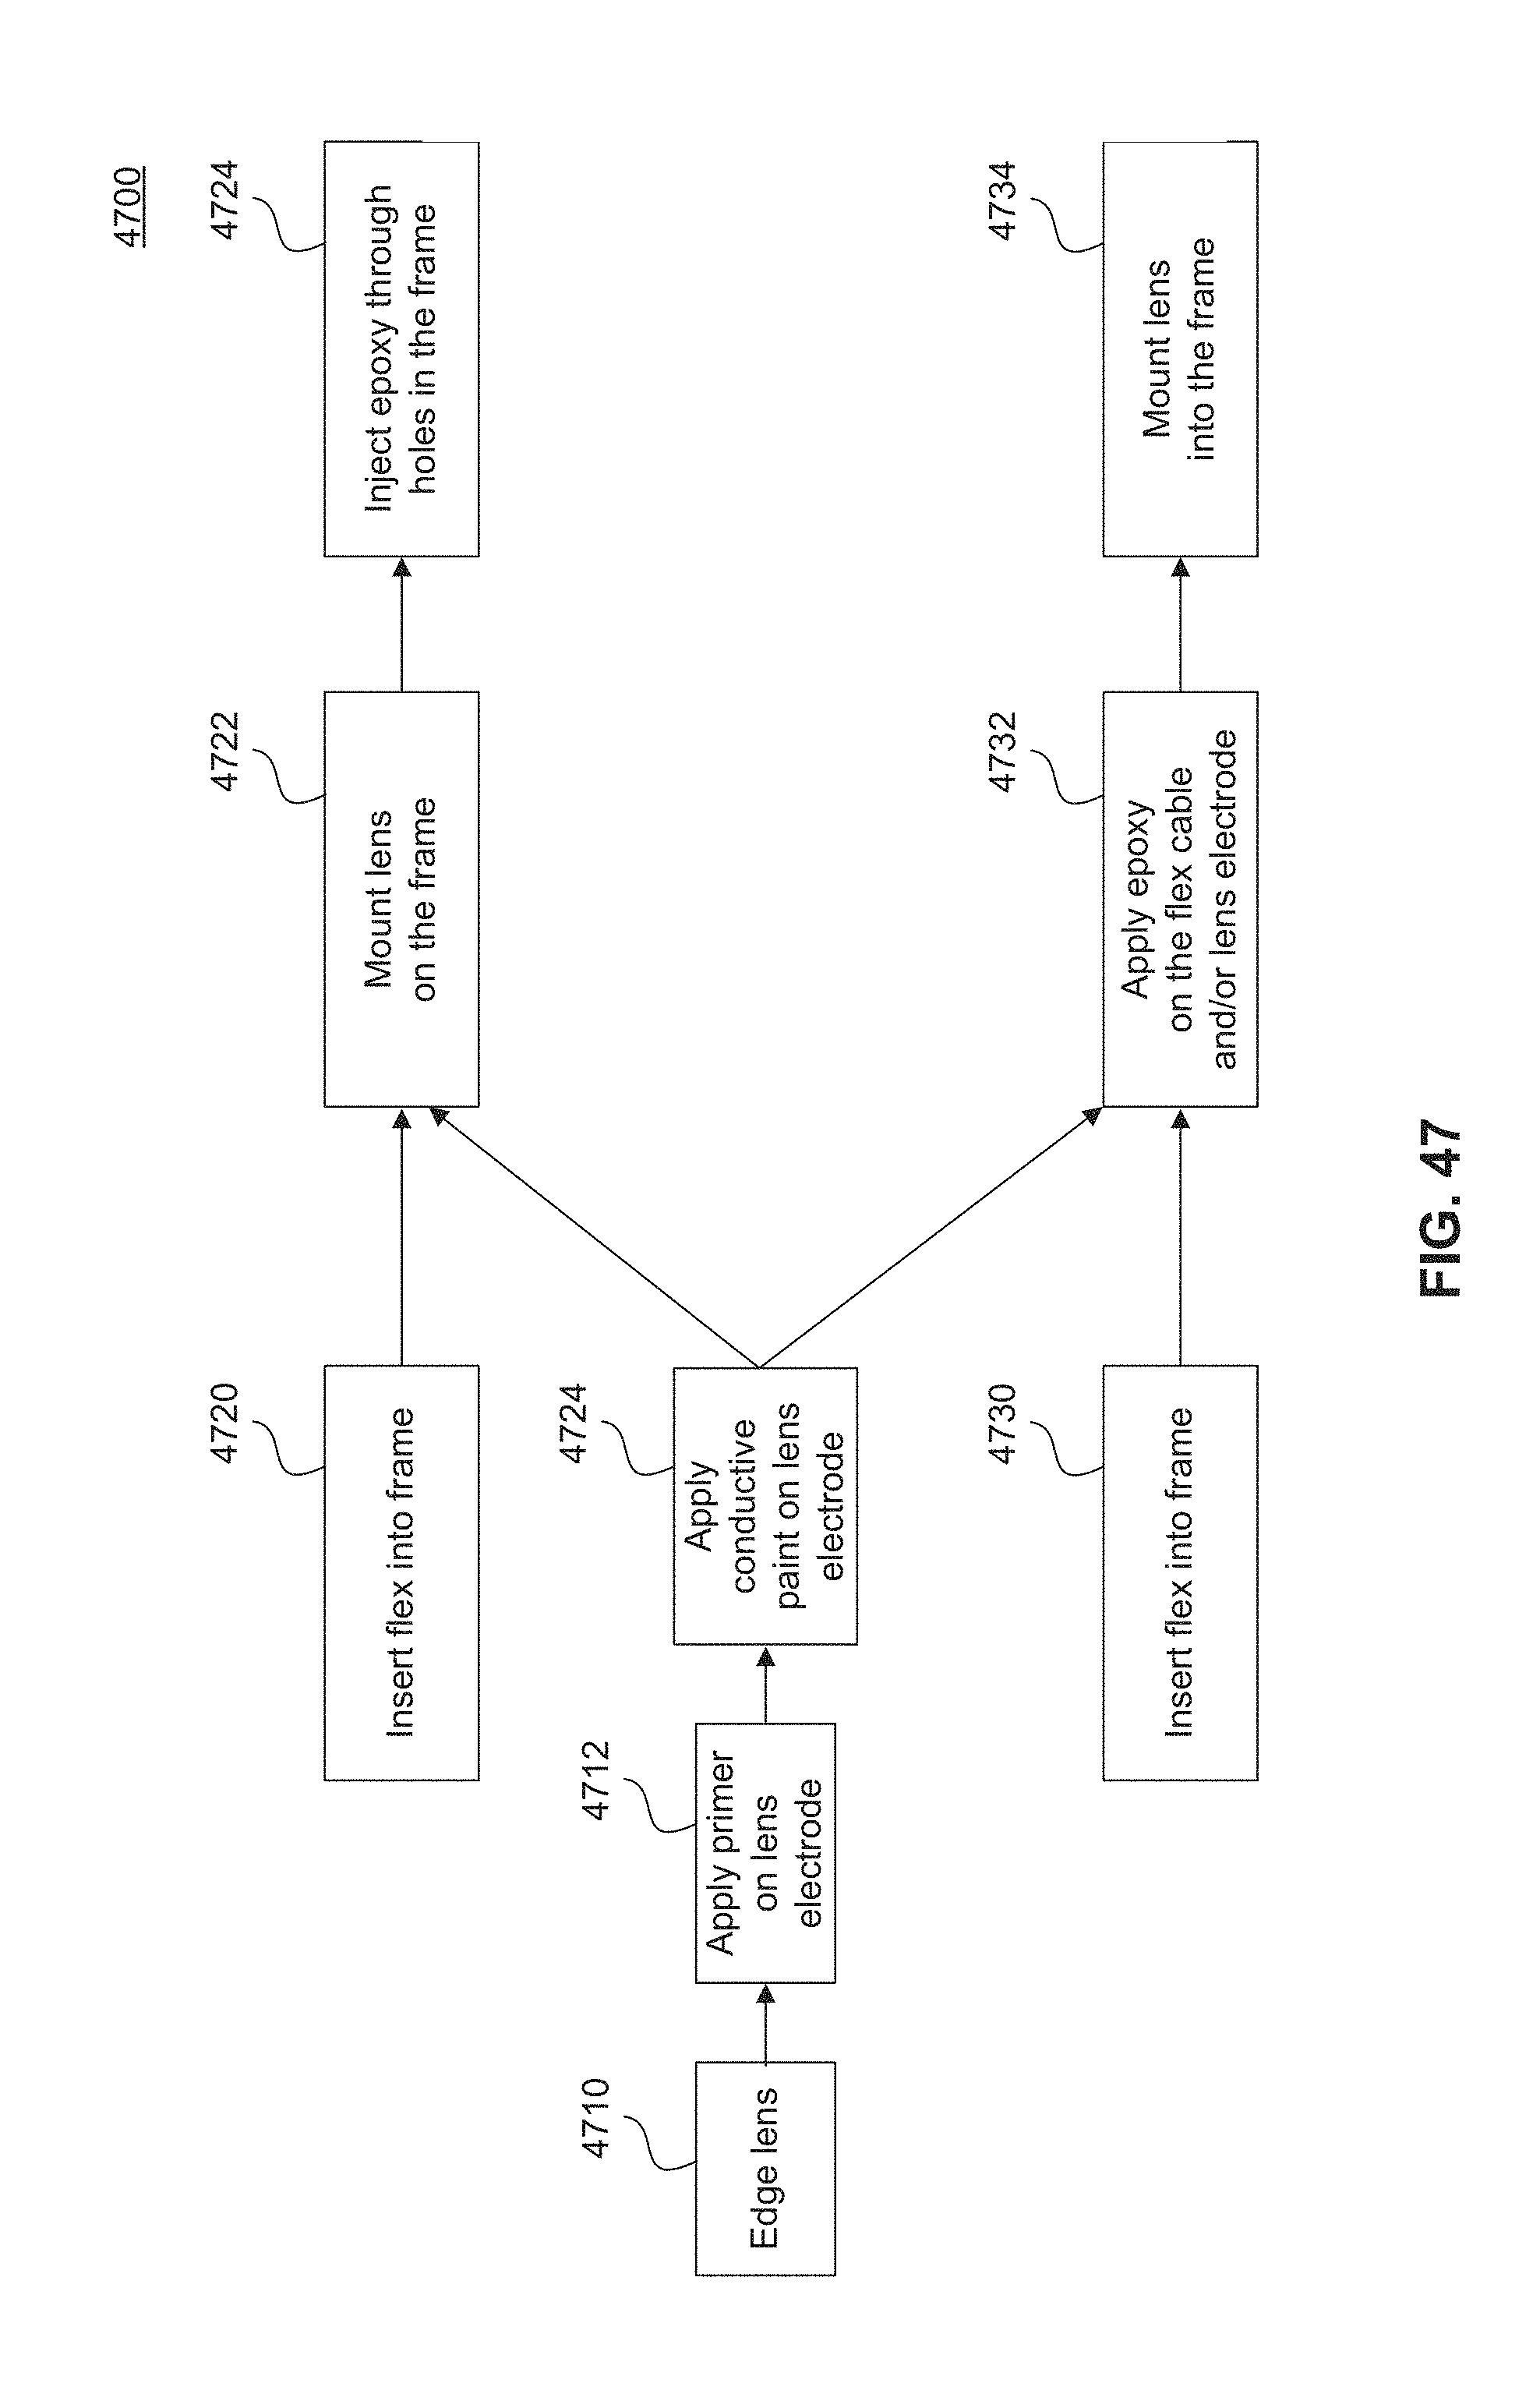 Patent US 10,168,551 B2